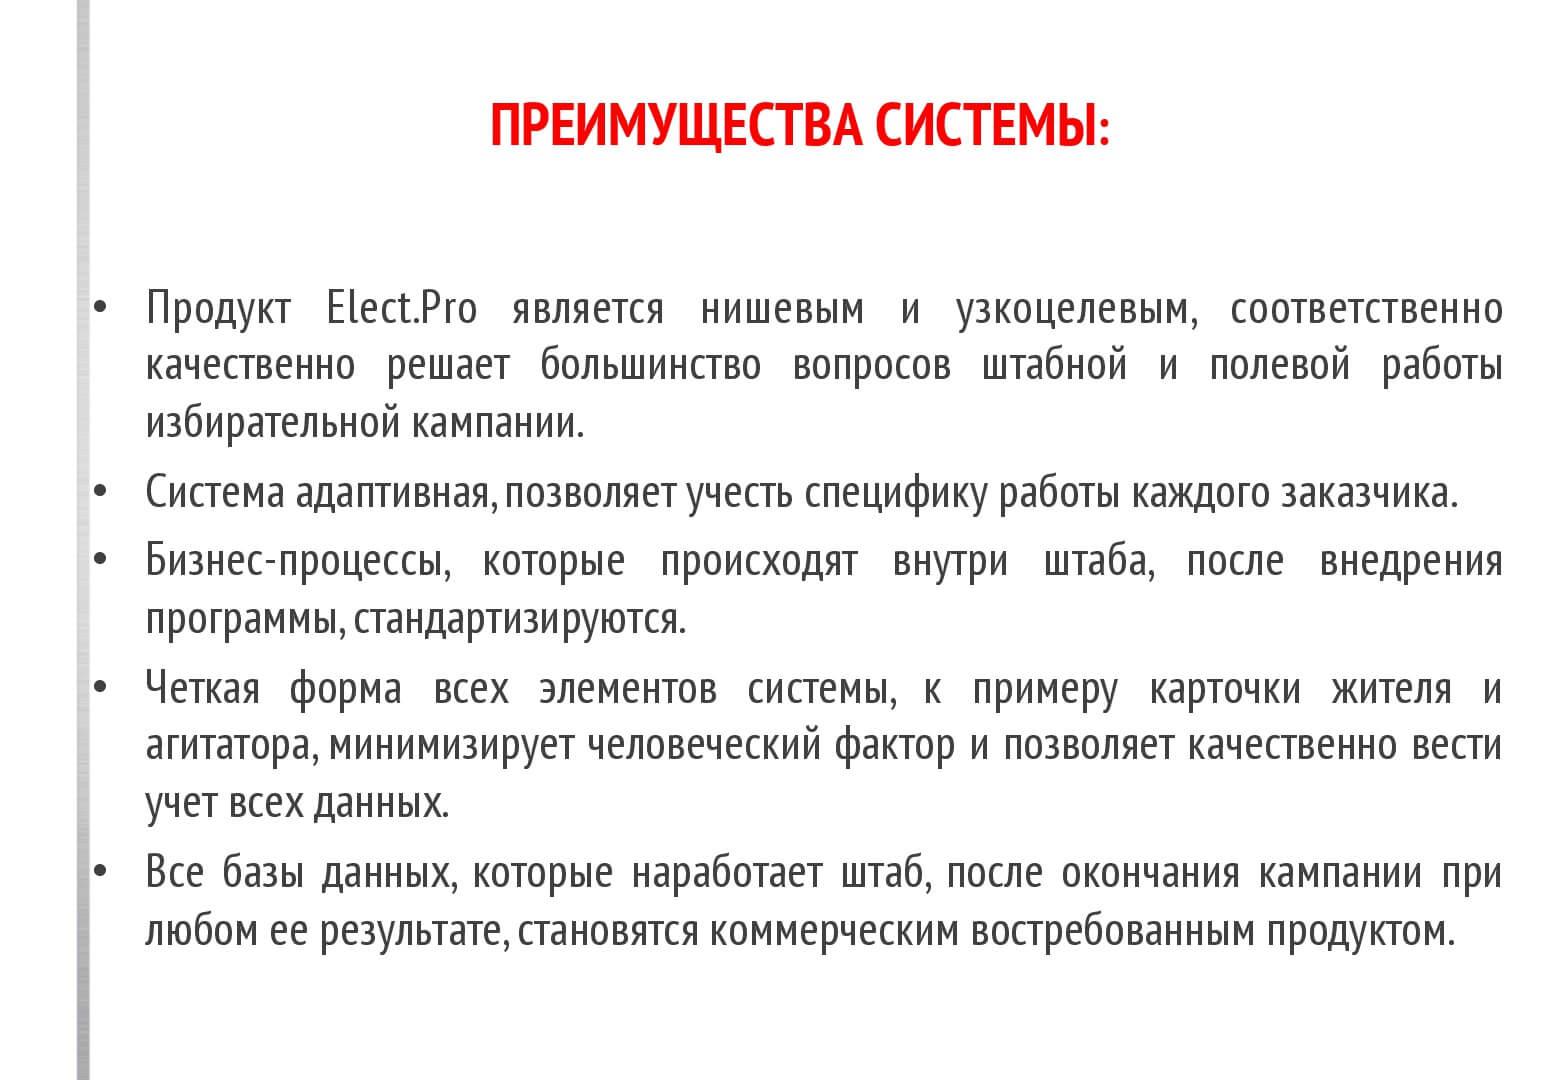 Elect.pro-BG-UA-022